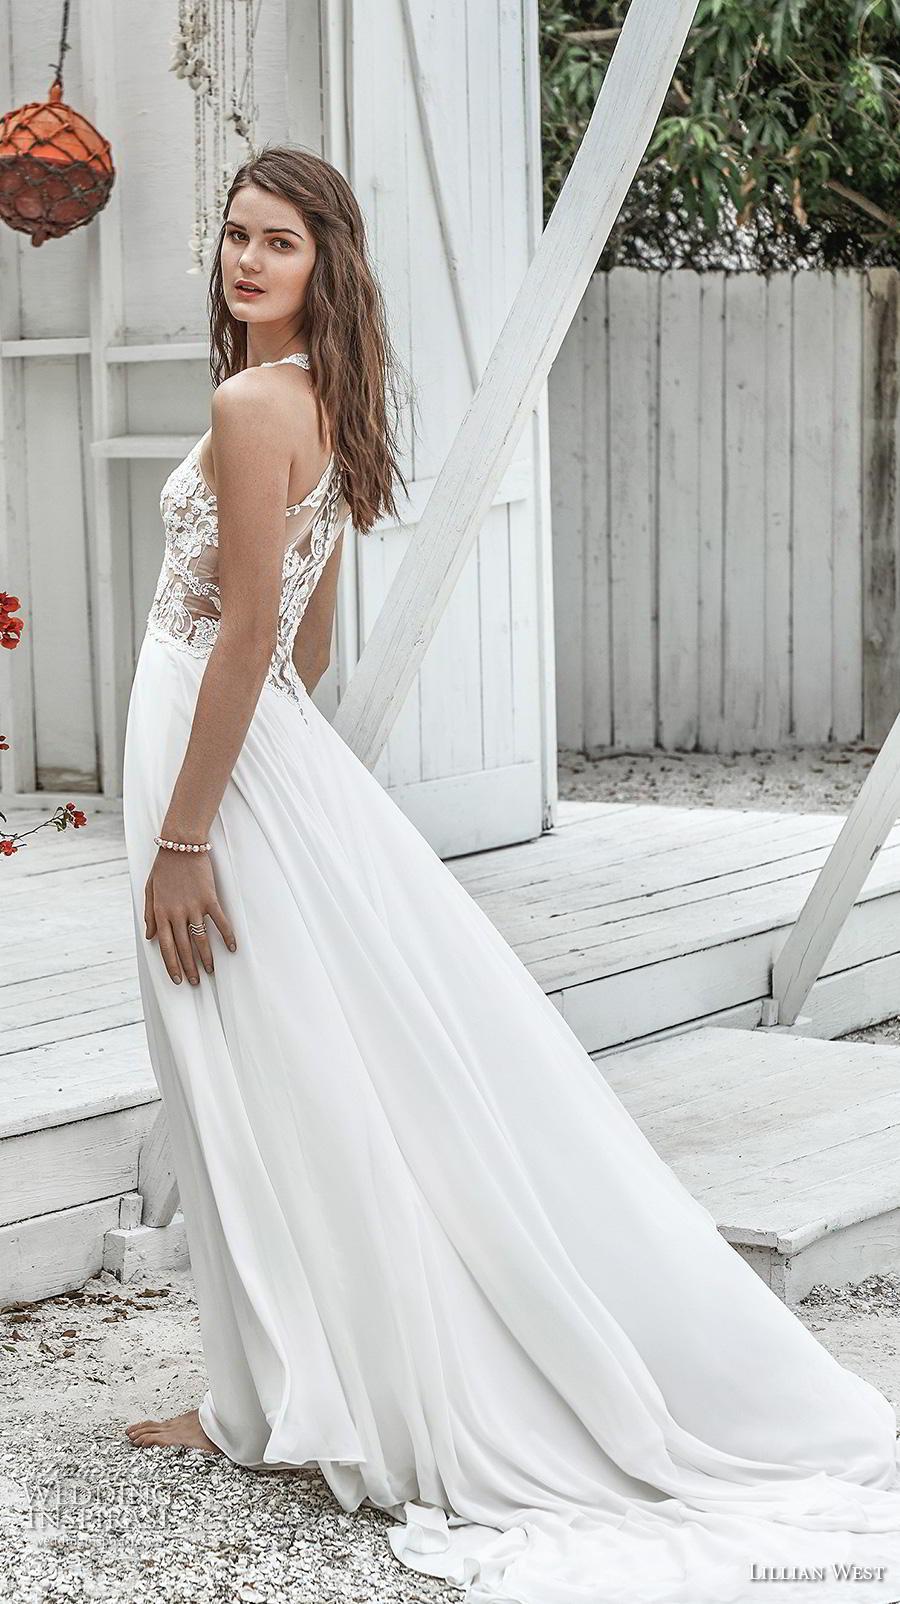 lillian west spring 2019 bridal thin strap sweetheart neckline heavily embellished bodice boho romantic soft a  line wedding dress rasor lace back chapel train (11) bv